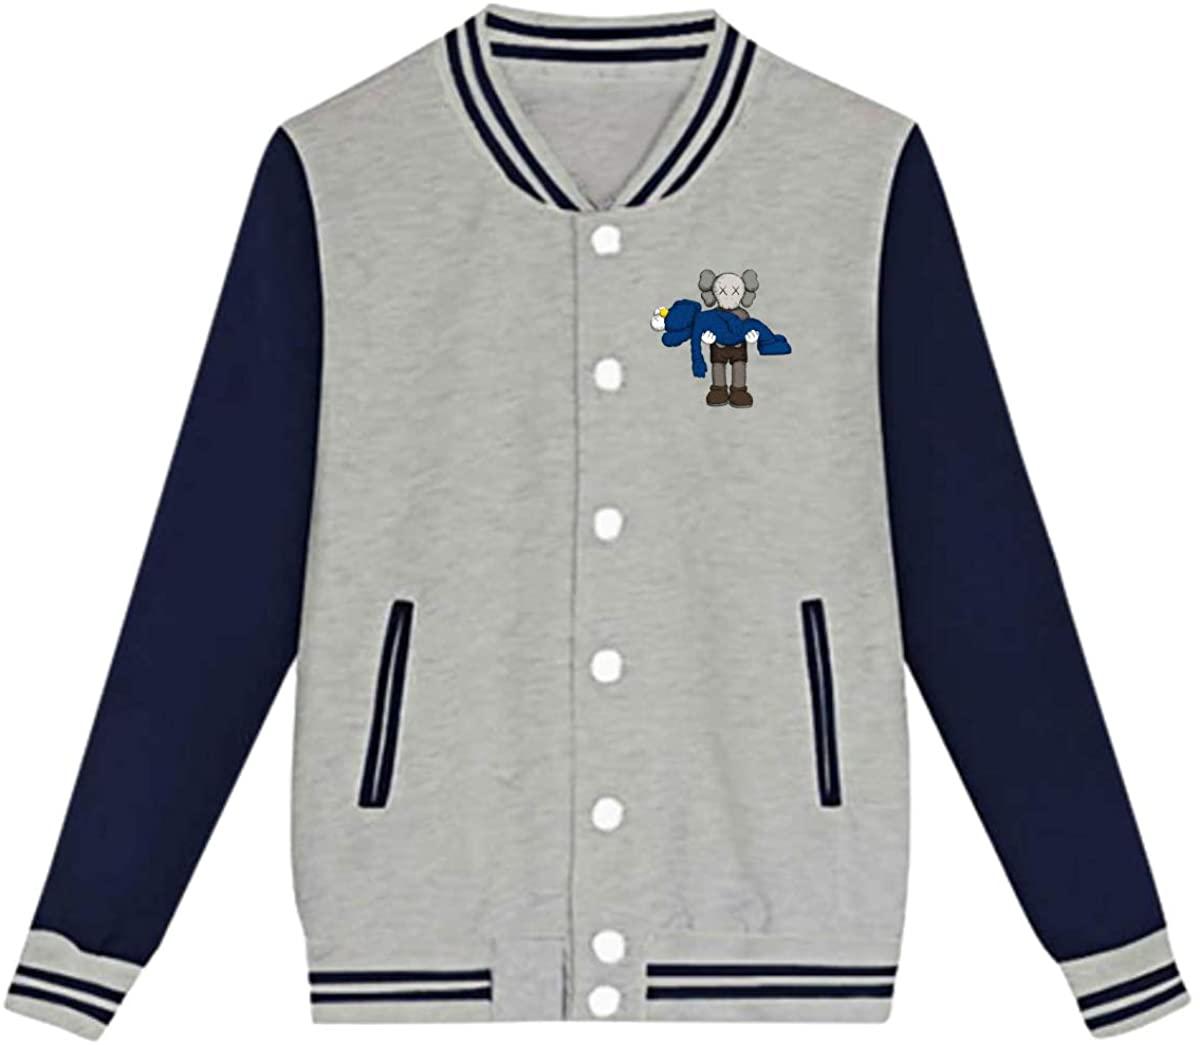 AHUAHUA KAWS Unisex Youth Boys and Girls Sweatshirt Baseball Uniform Jacket Sport Coat